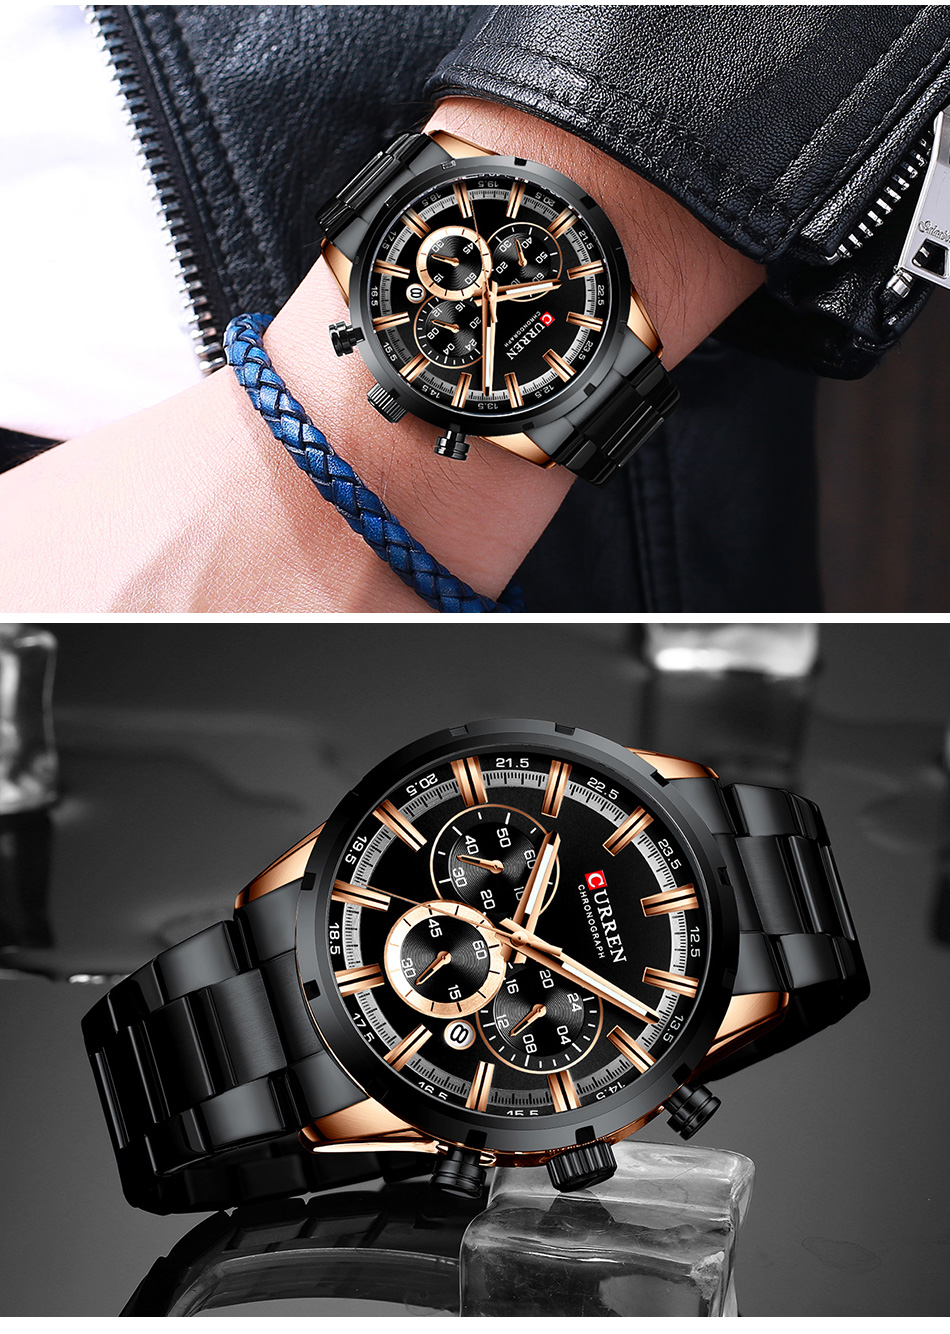 H295ef6ca65284c41b93486515f6de88cU CURREN Men Watch Top Brand Luxury Sports Quartz Mens Watches Full Steel Waterproof Chronograph Wristwatch Men Relogio Masculino